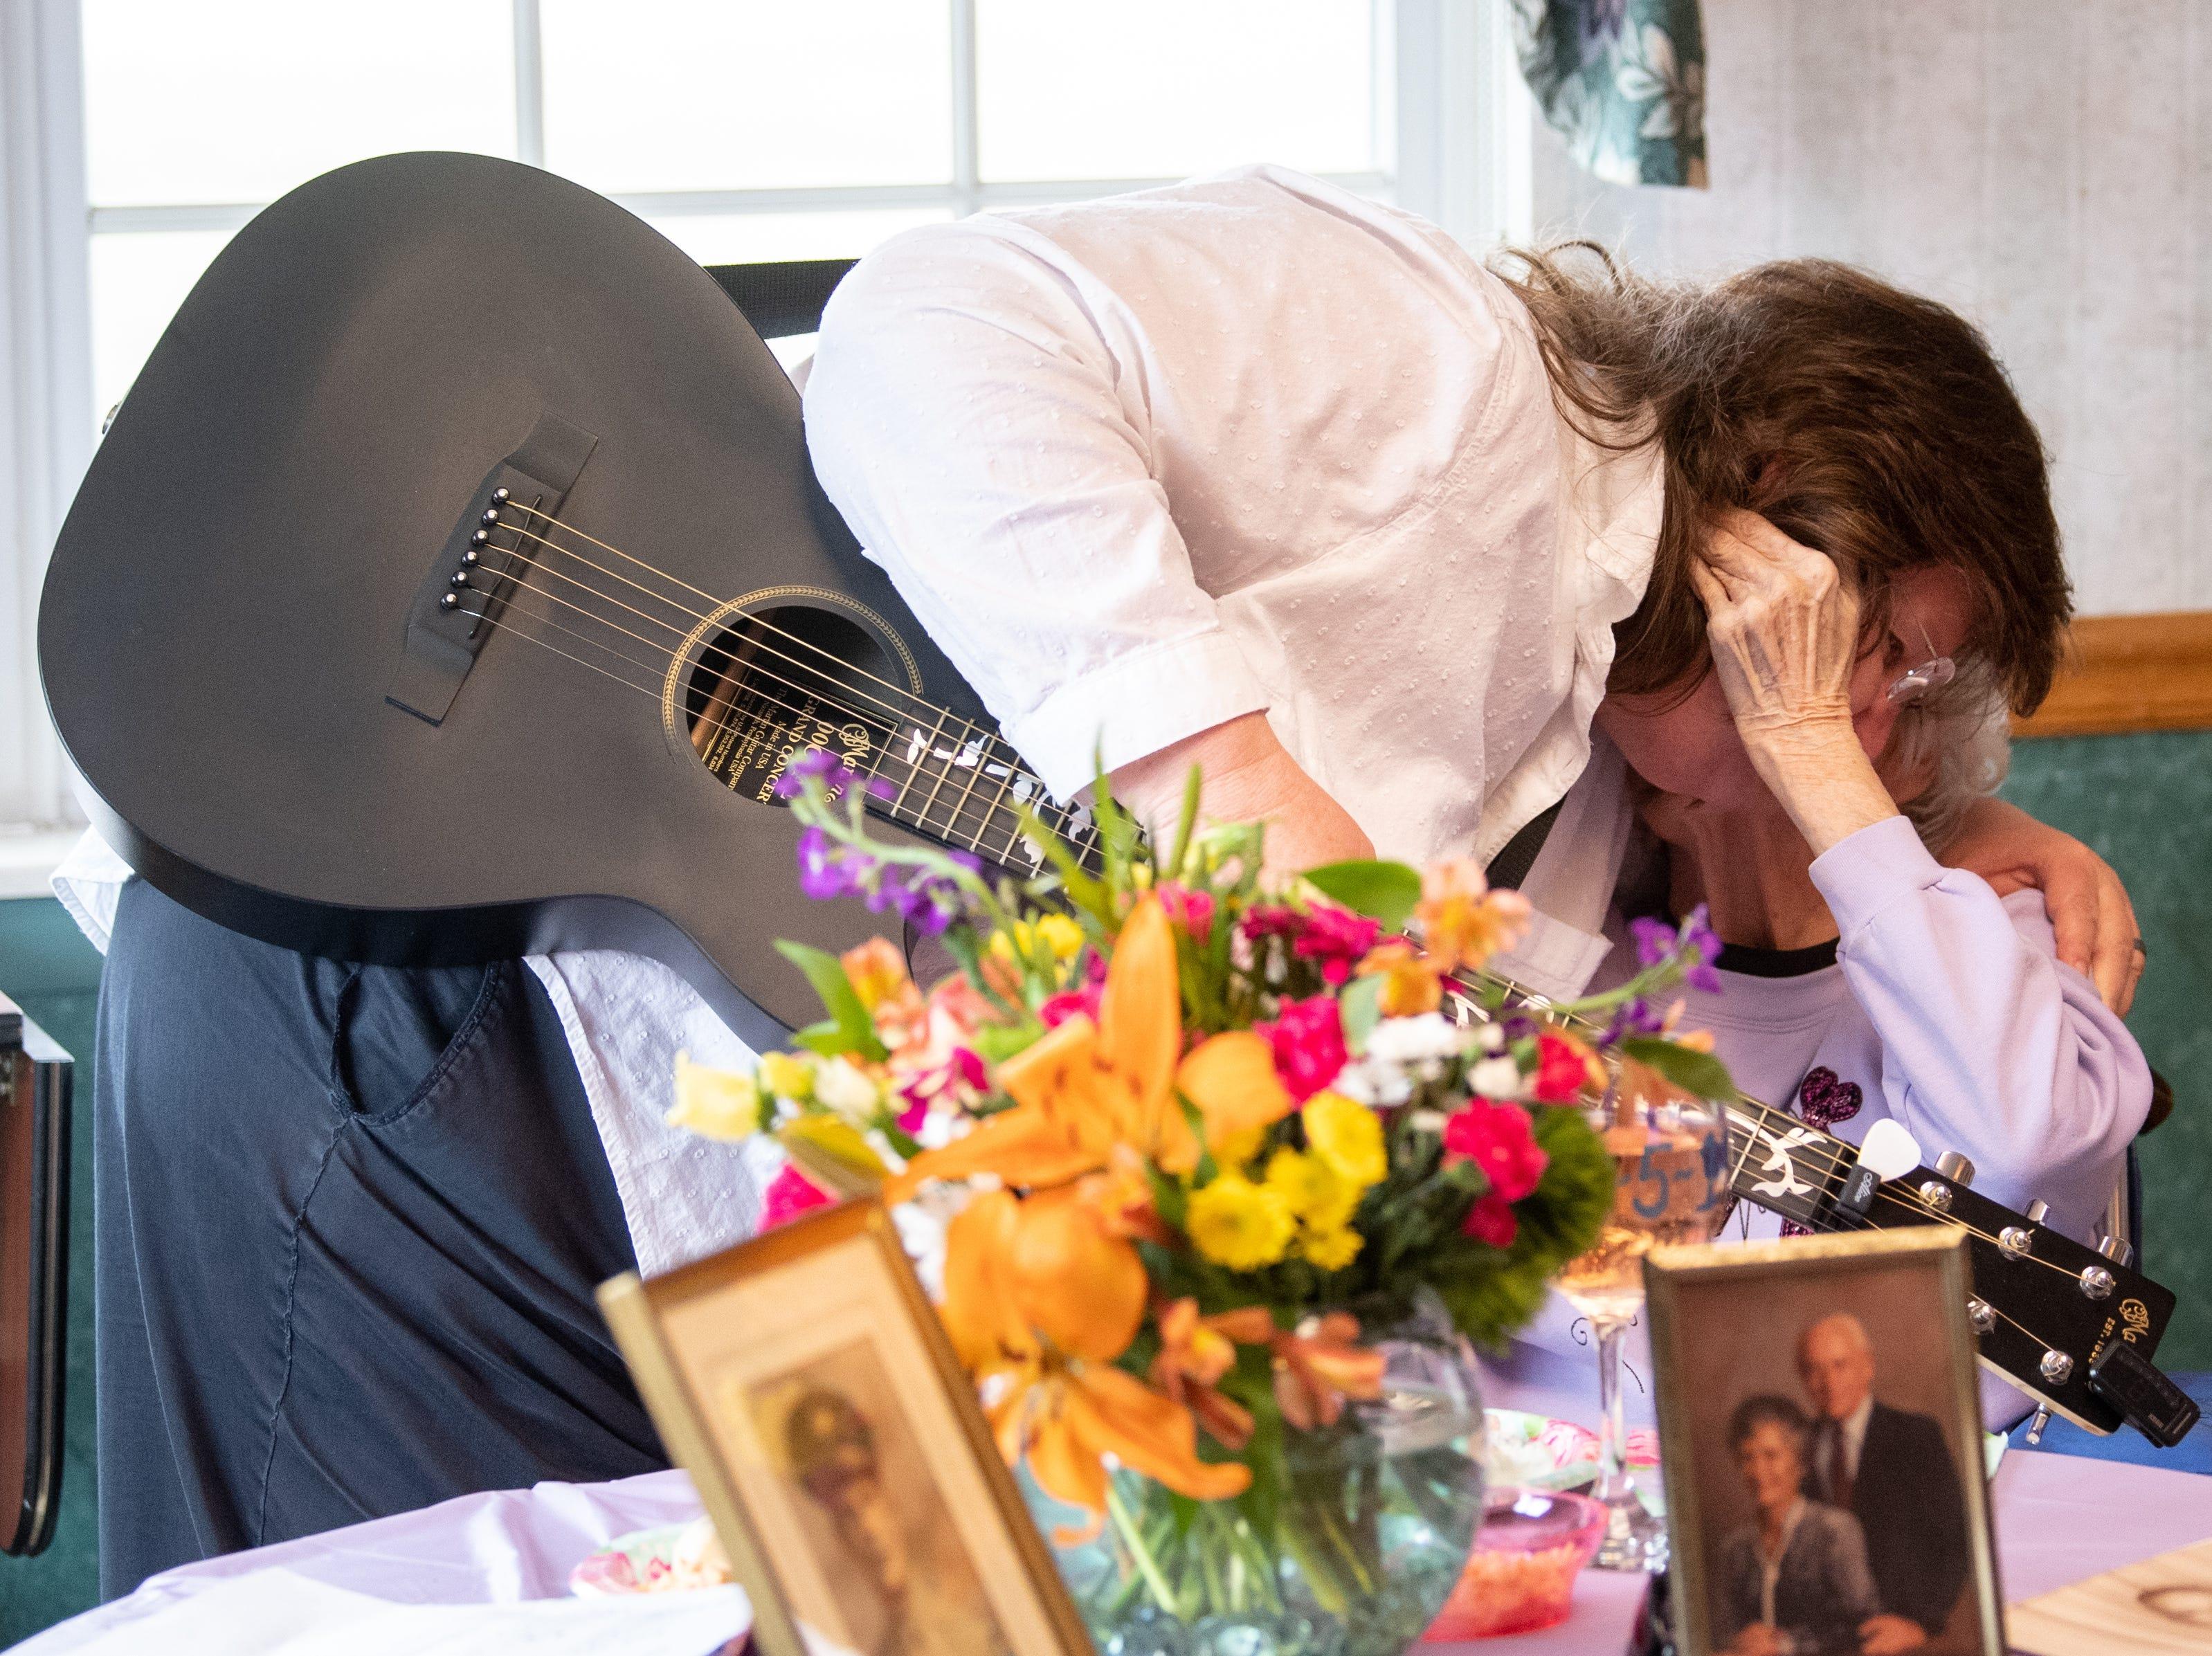 Spiritual Care Coordinator Margie Stevens gives Ann a hug after playing, April 5, 2019.